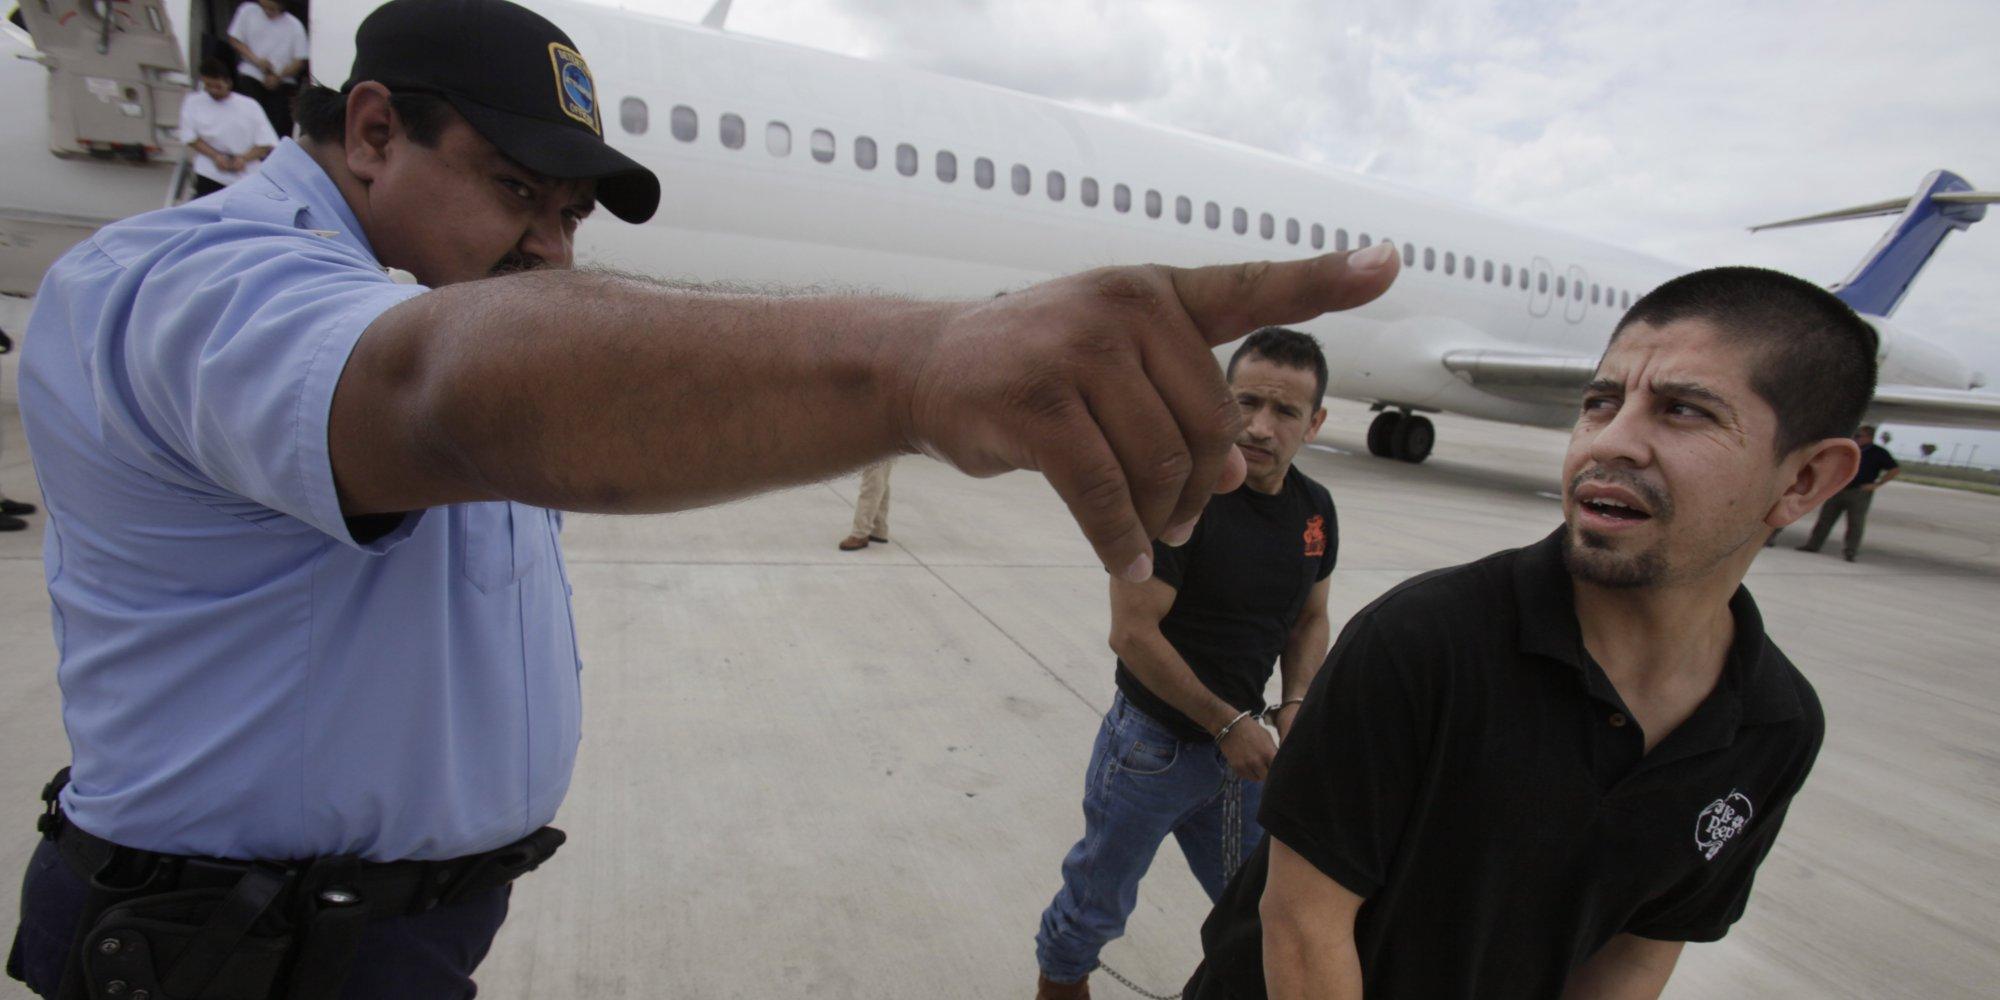 Deportaciones ilegales de EUA crecen pese a riesgo mortal: New Yorker